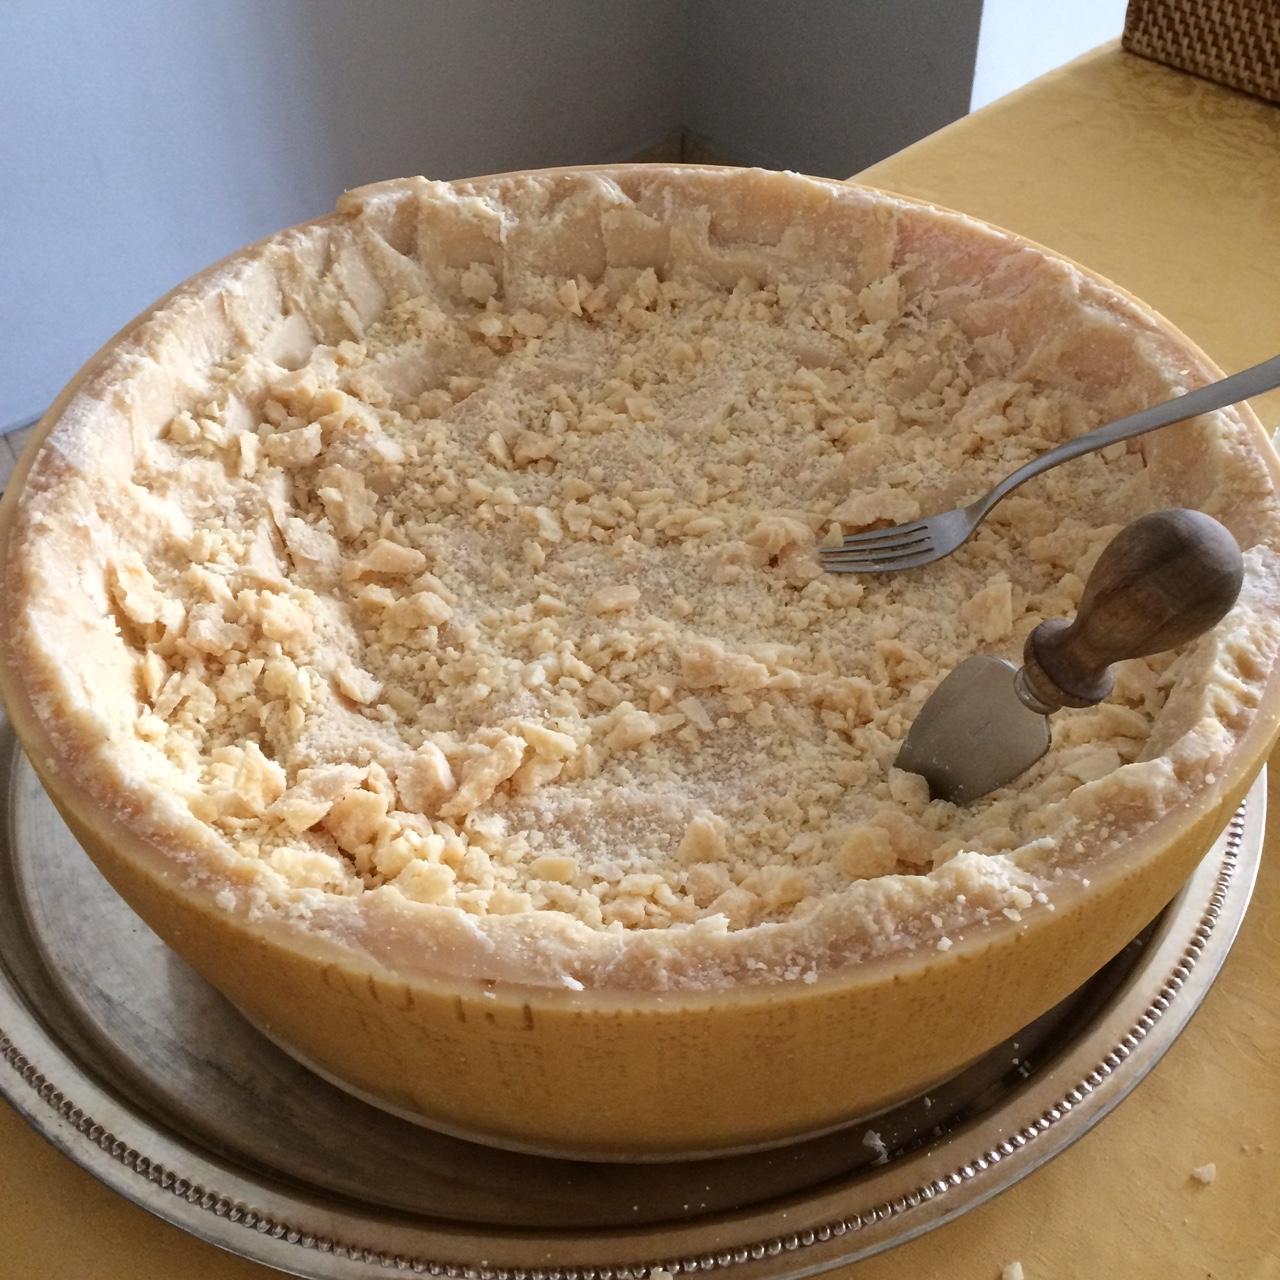 Fullsize Of Wheel Of Cheese